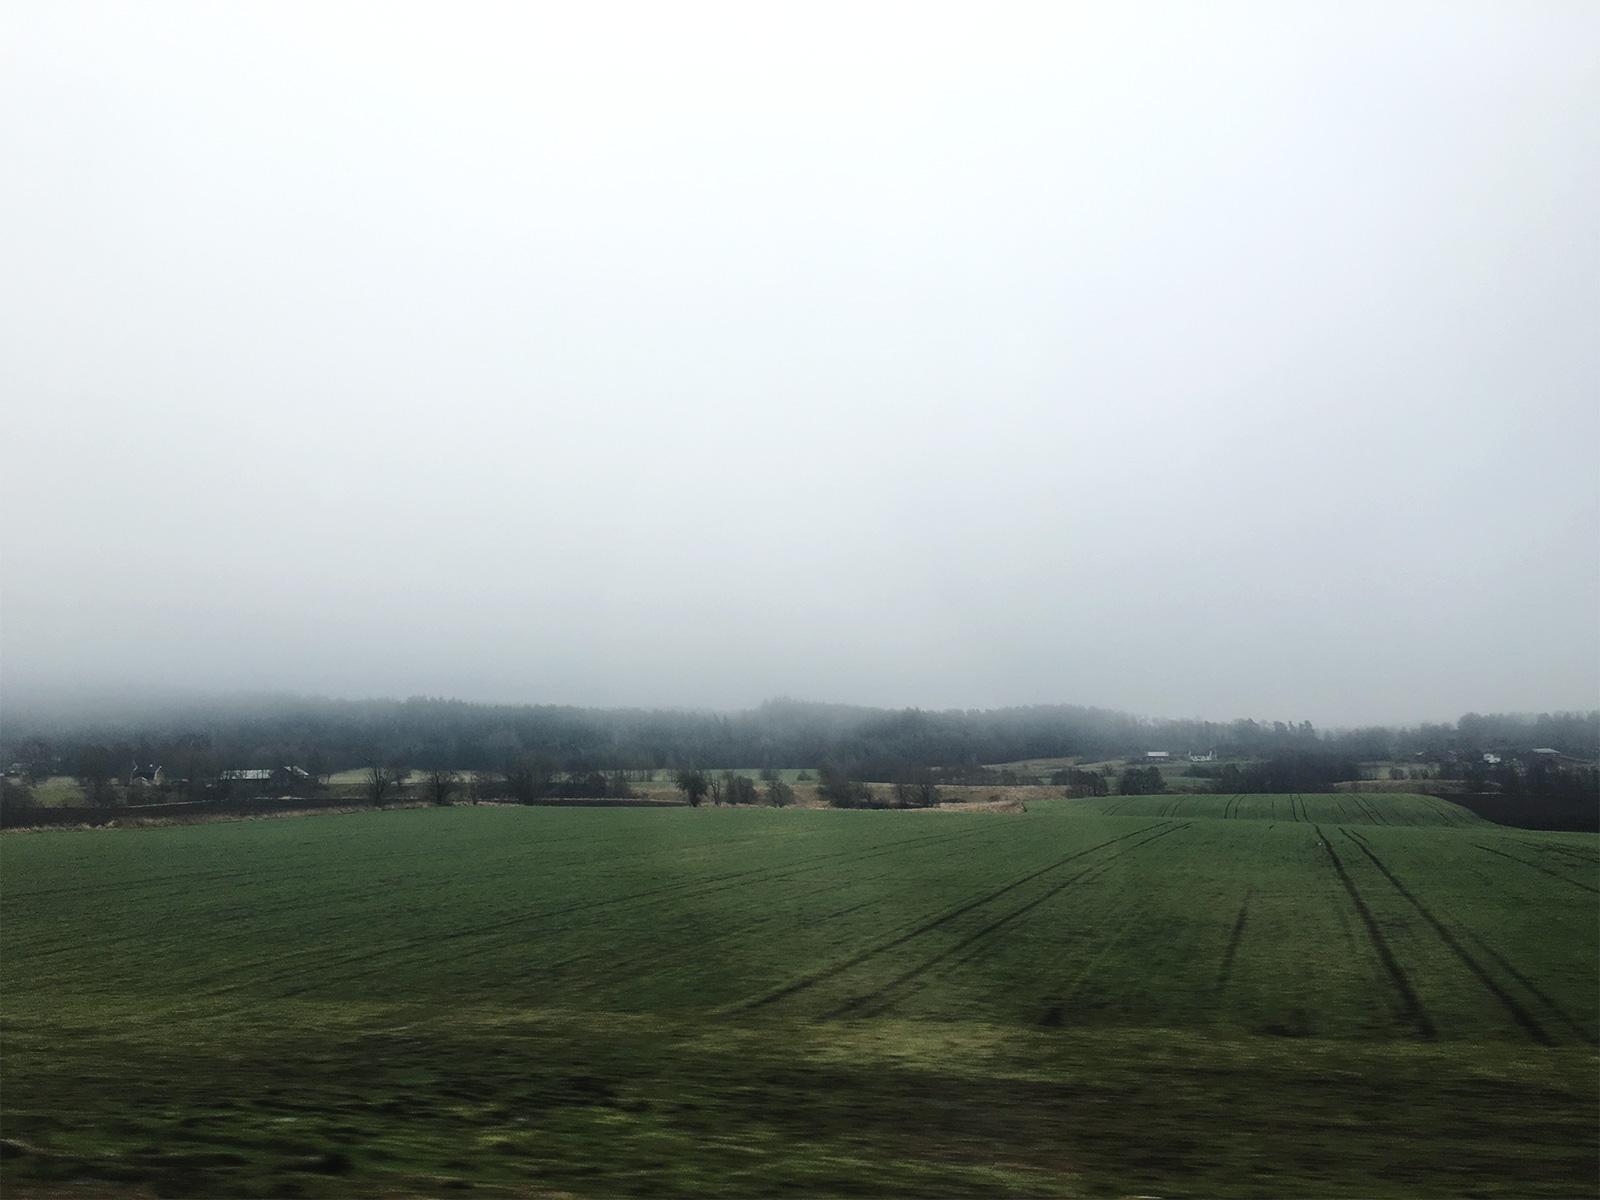 husvisning-bjorboholm-01